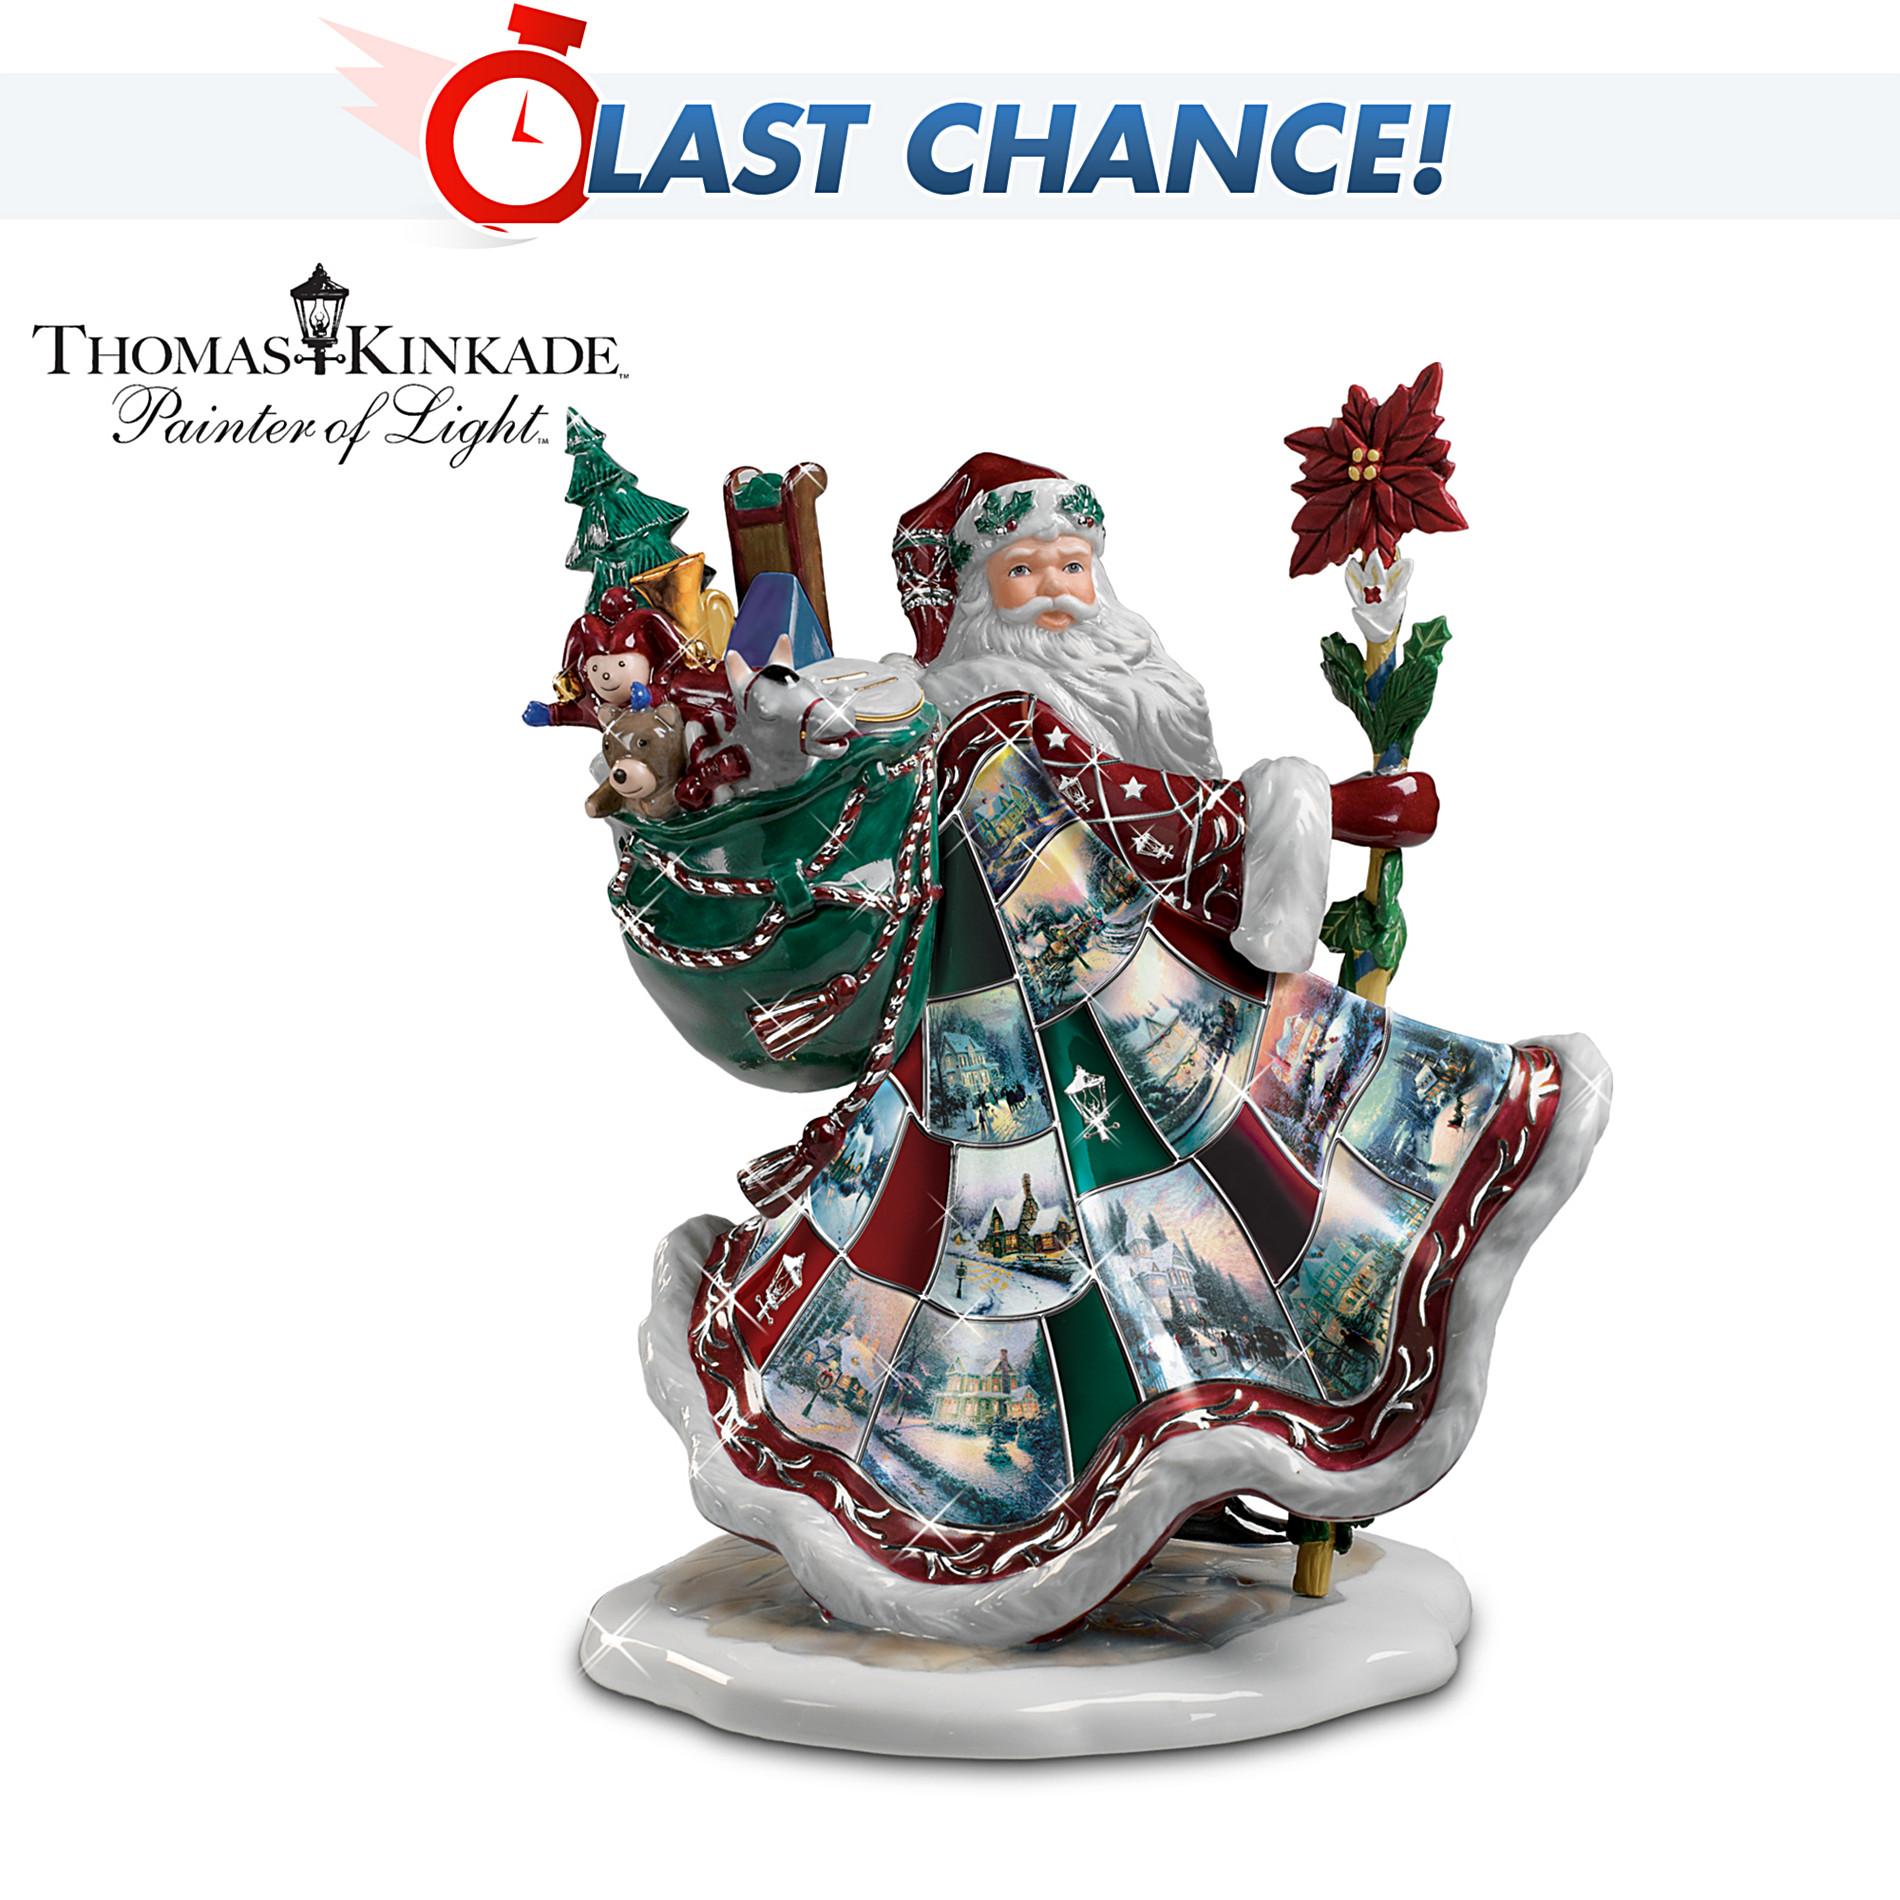 The bradford exchange thomas kinkade musical santa claus